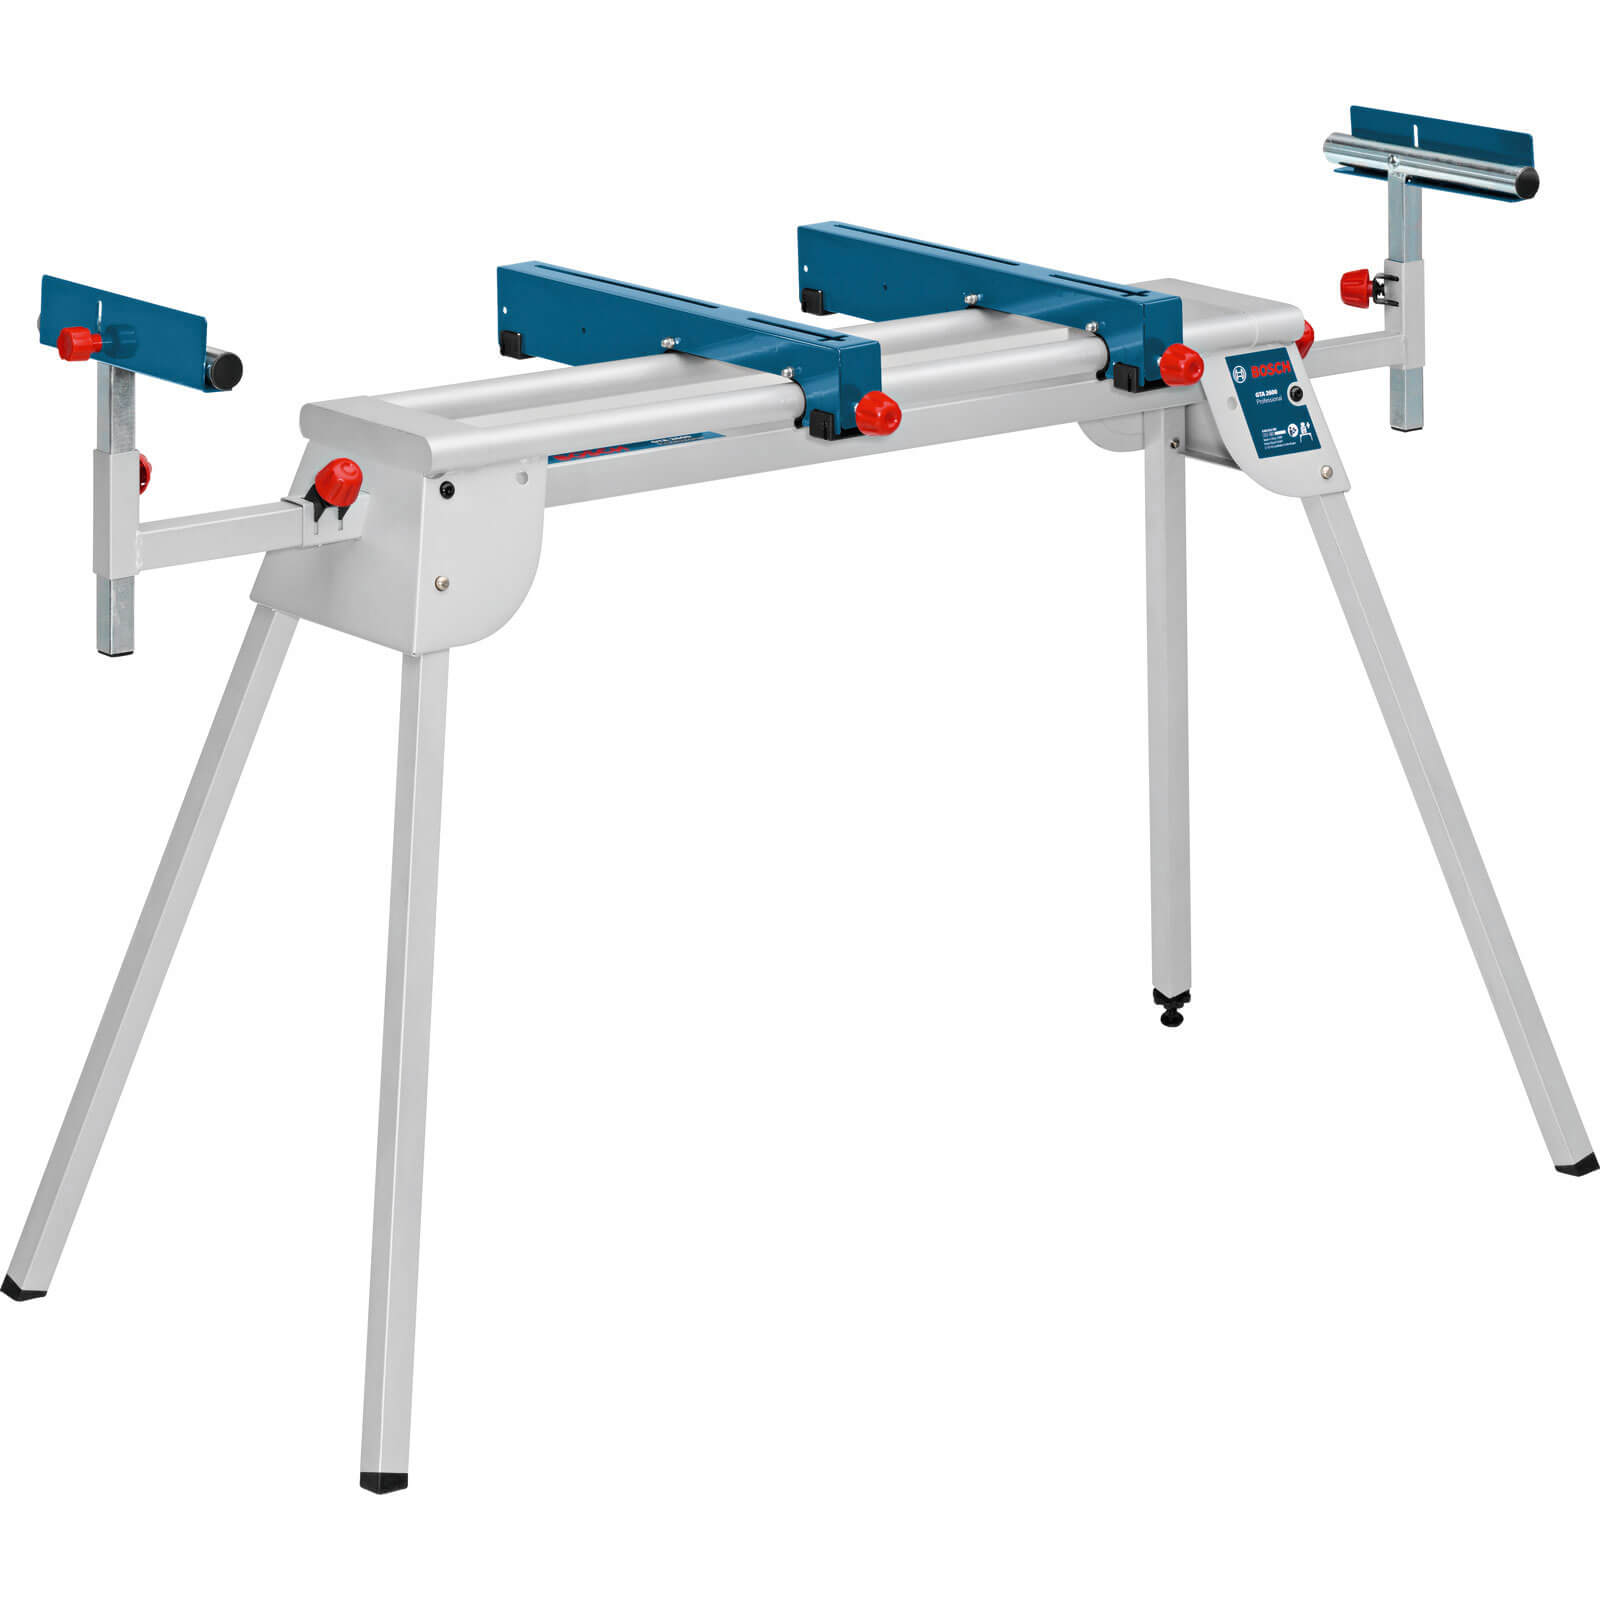 Bosch GTA 2600 Universal Mitre Saw Stand